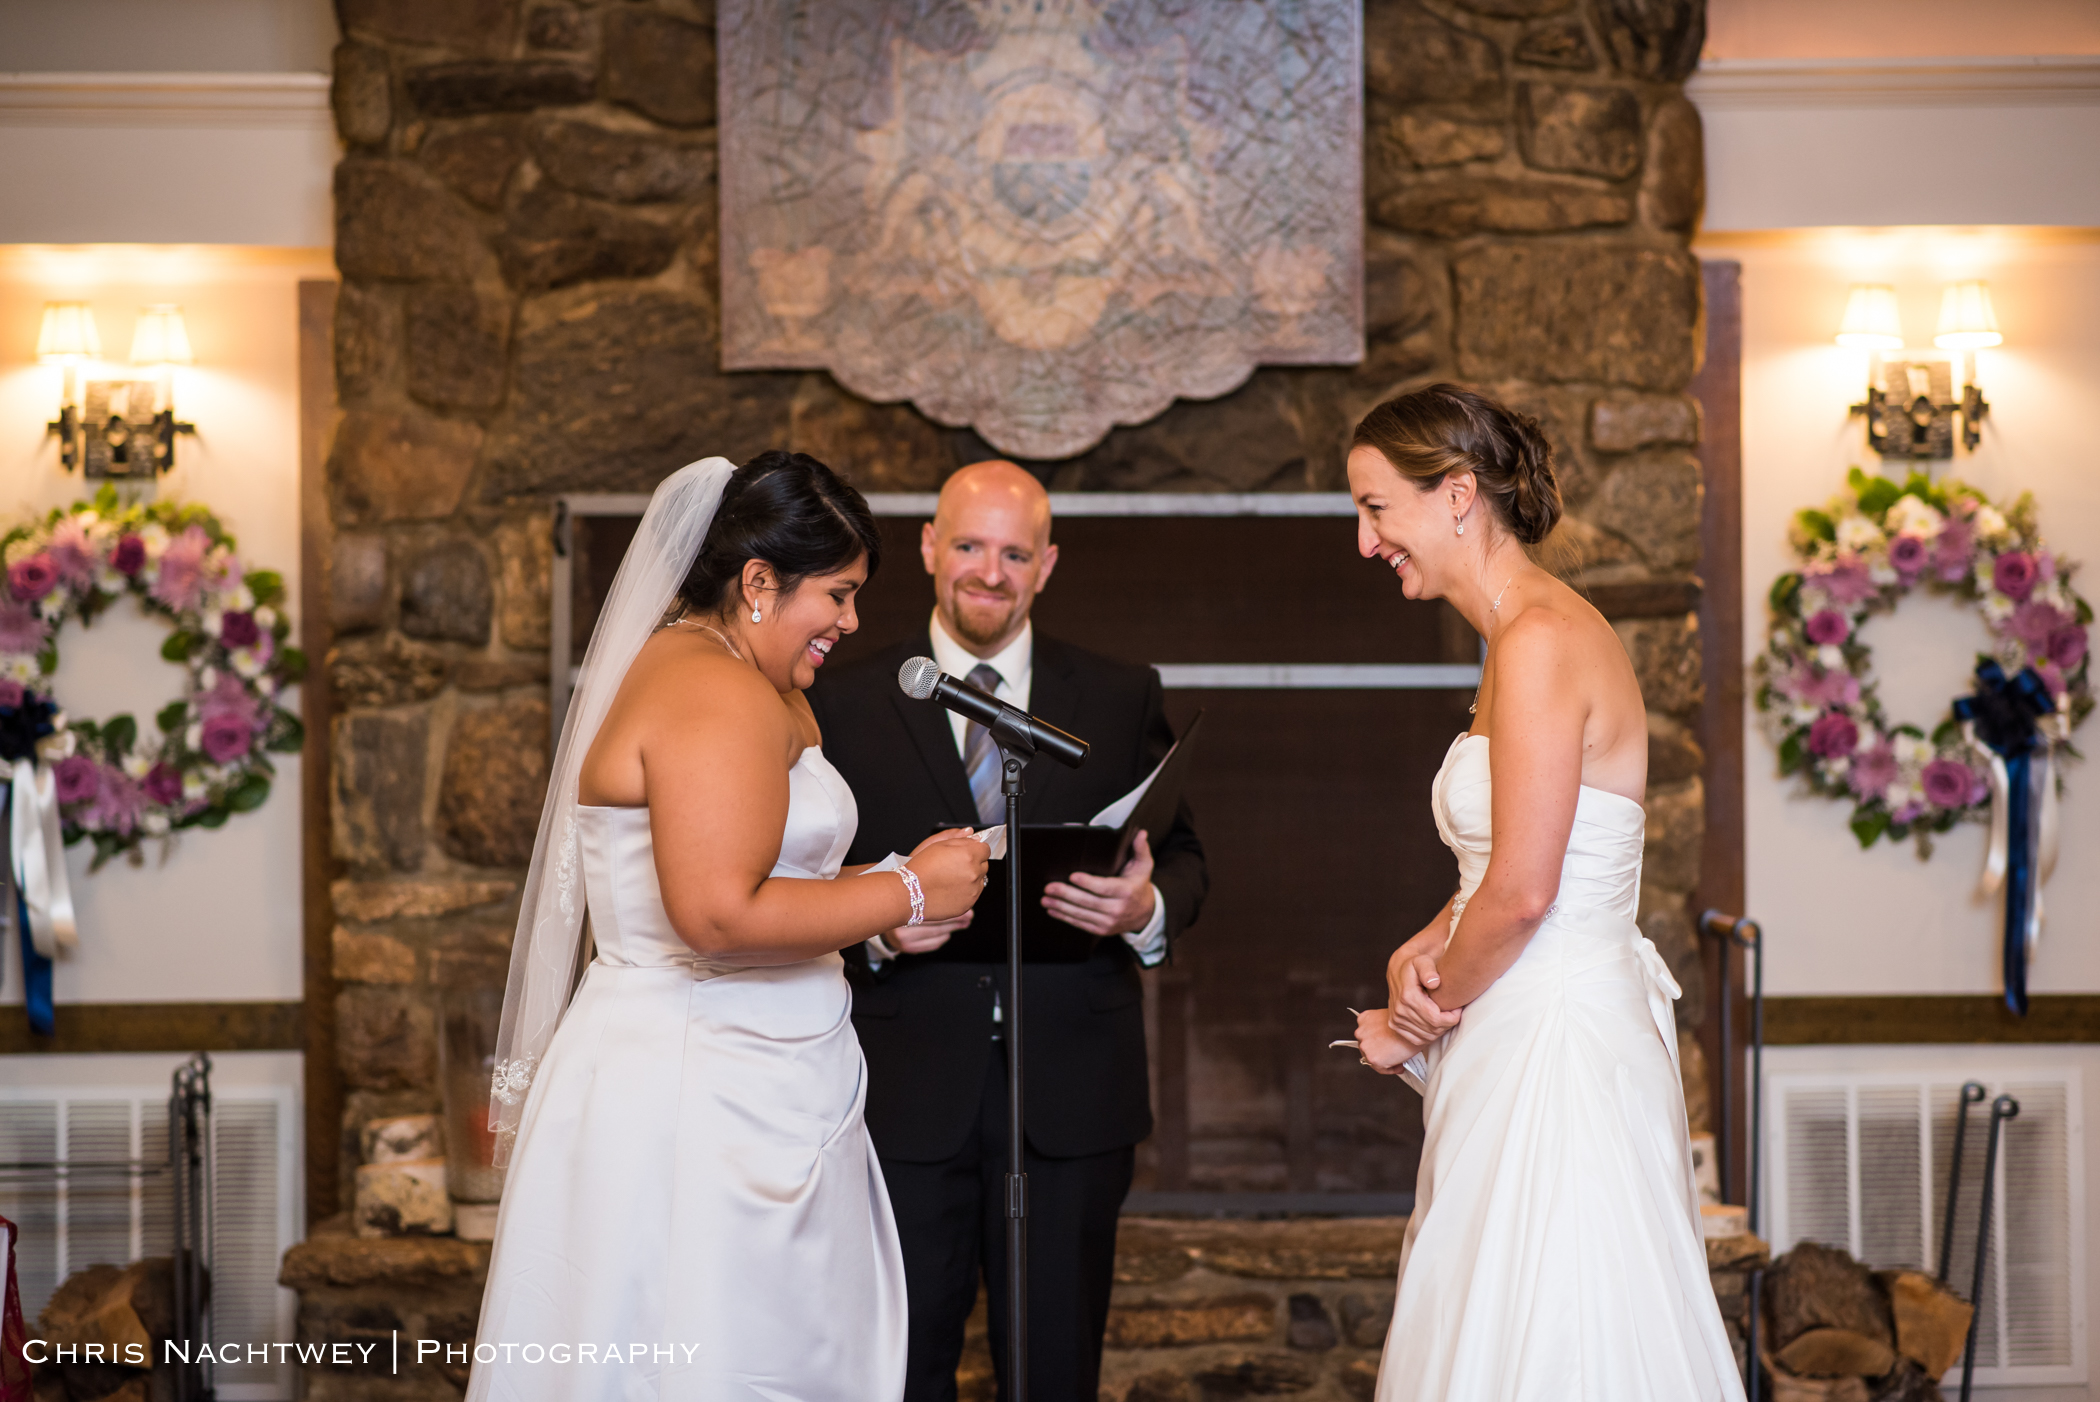 connecticut-same-sex-wedding-photographers-chris-nachtwey-2018-lisa-karina-18.jpg